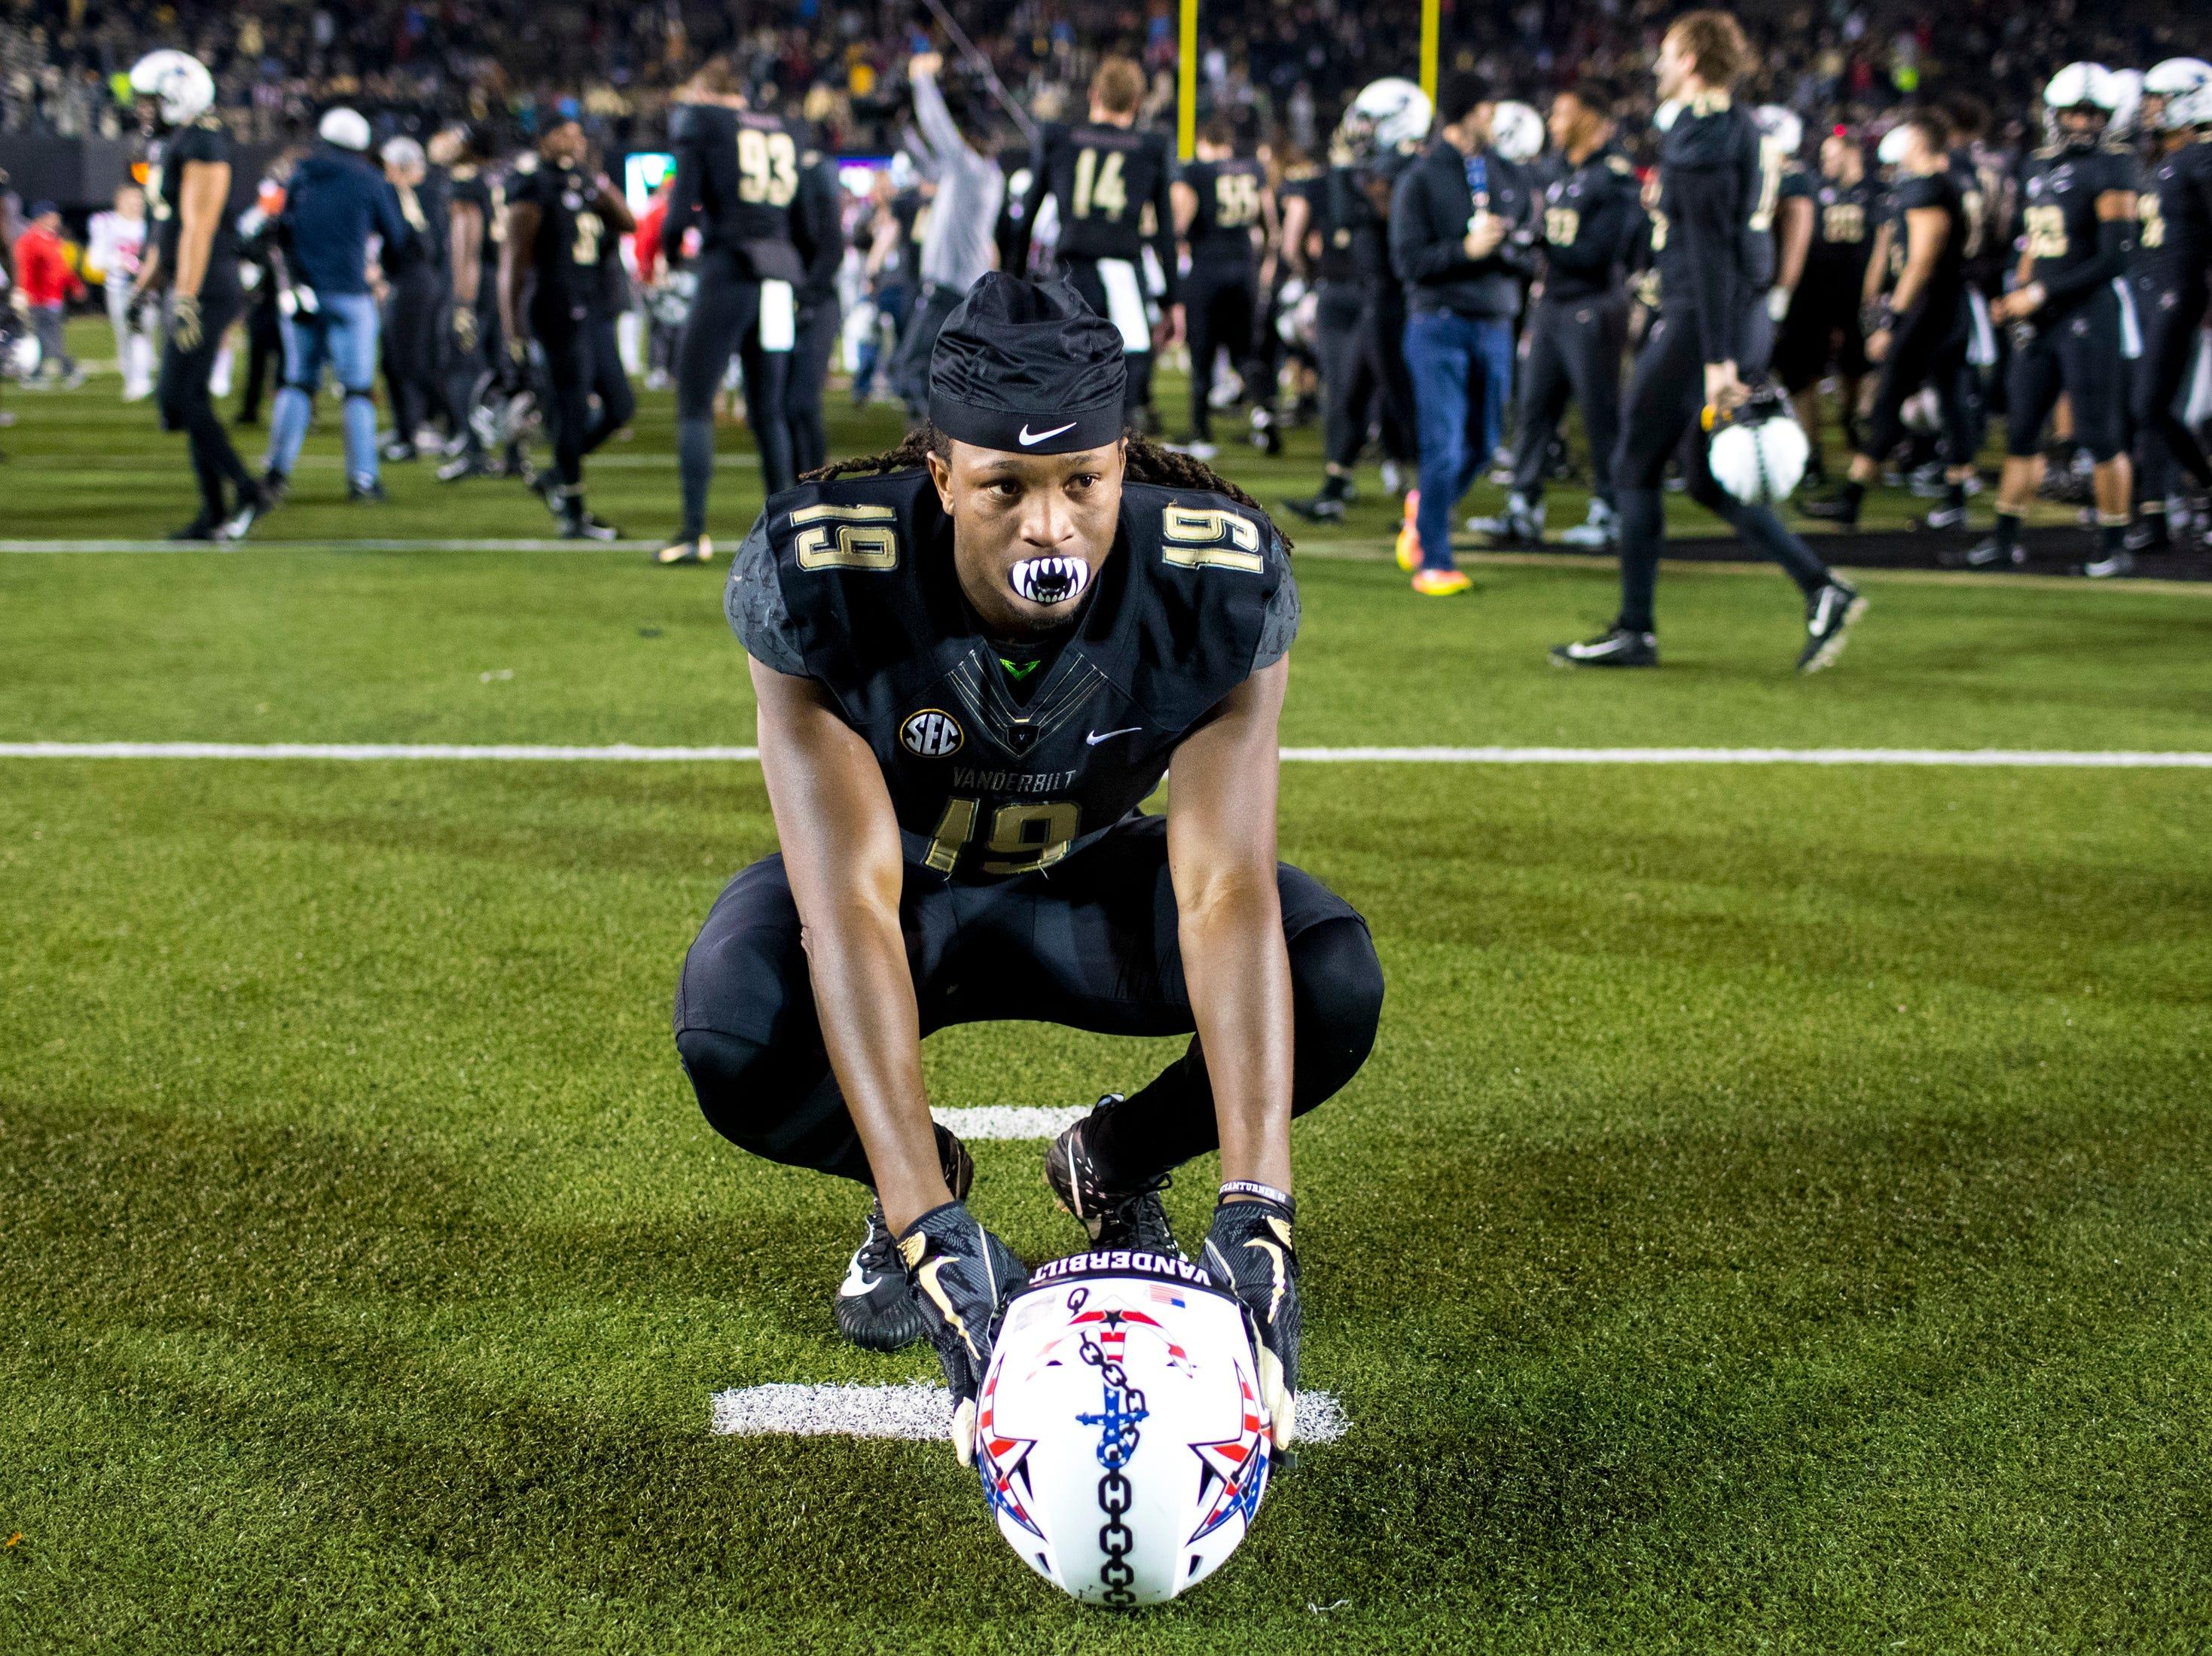 Vanderbilt wide receiver Chris Pierce (19) takes a moment to himself after Vanderbilt's game against Ole Miss at Vanderbilt Stadium in Nashville on Saturday, Nov. 17, 2018.